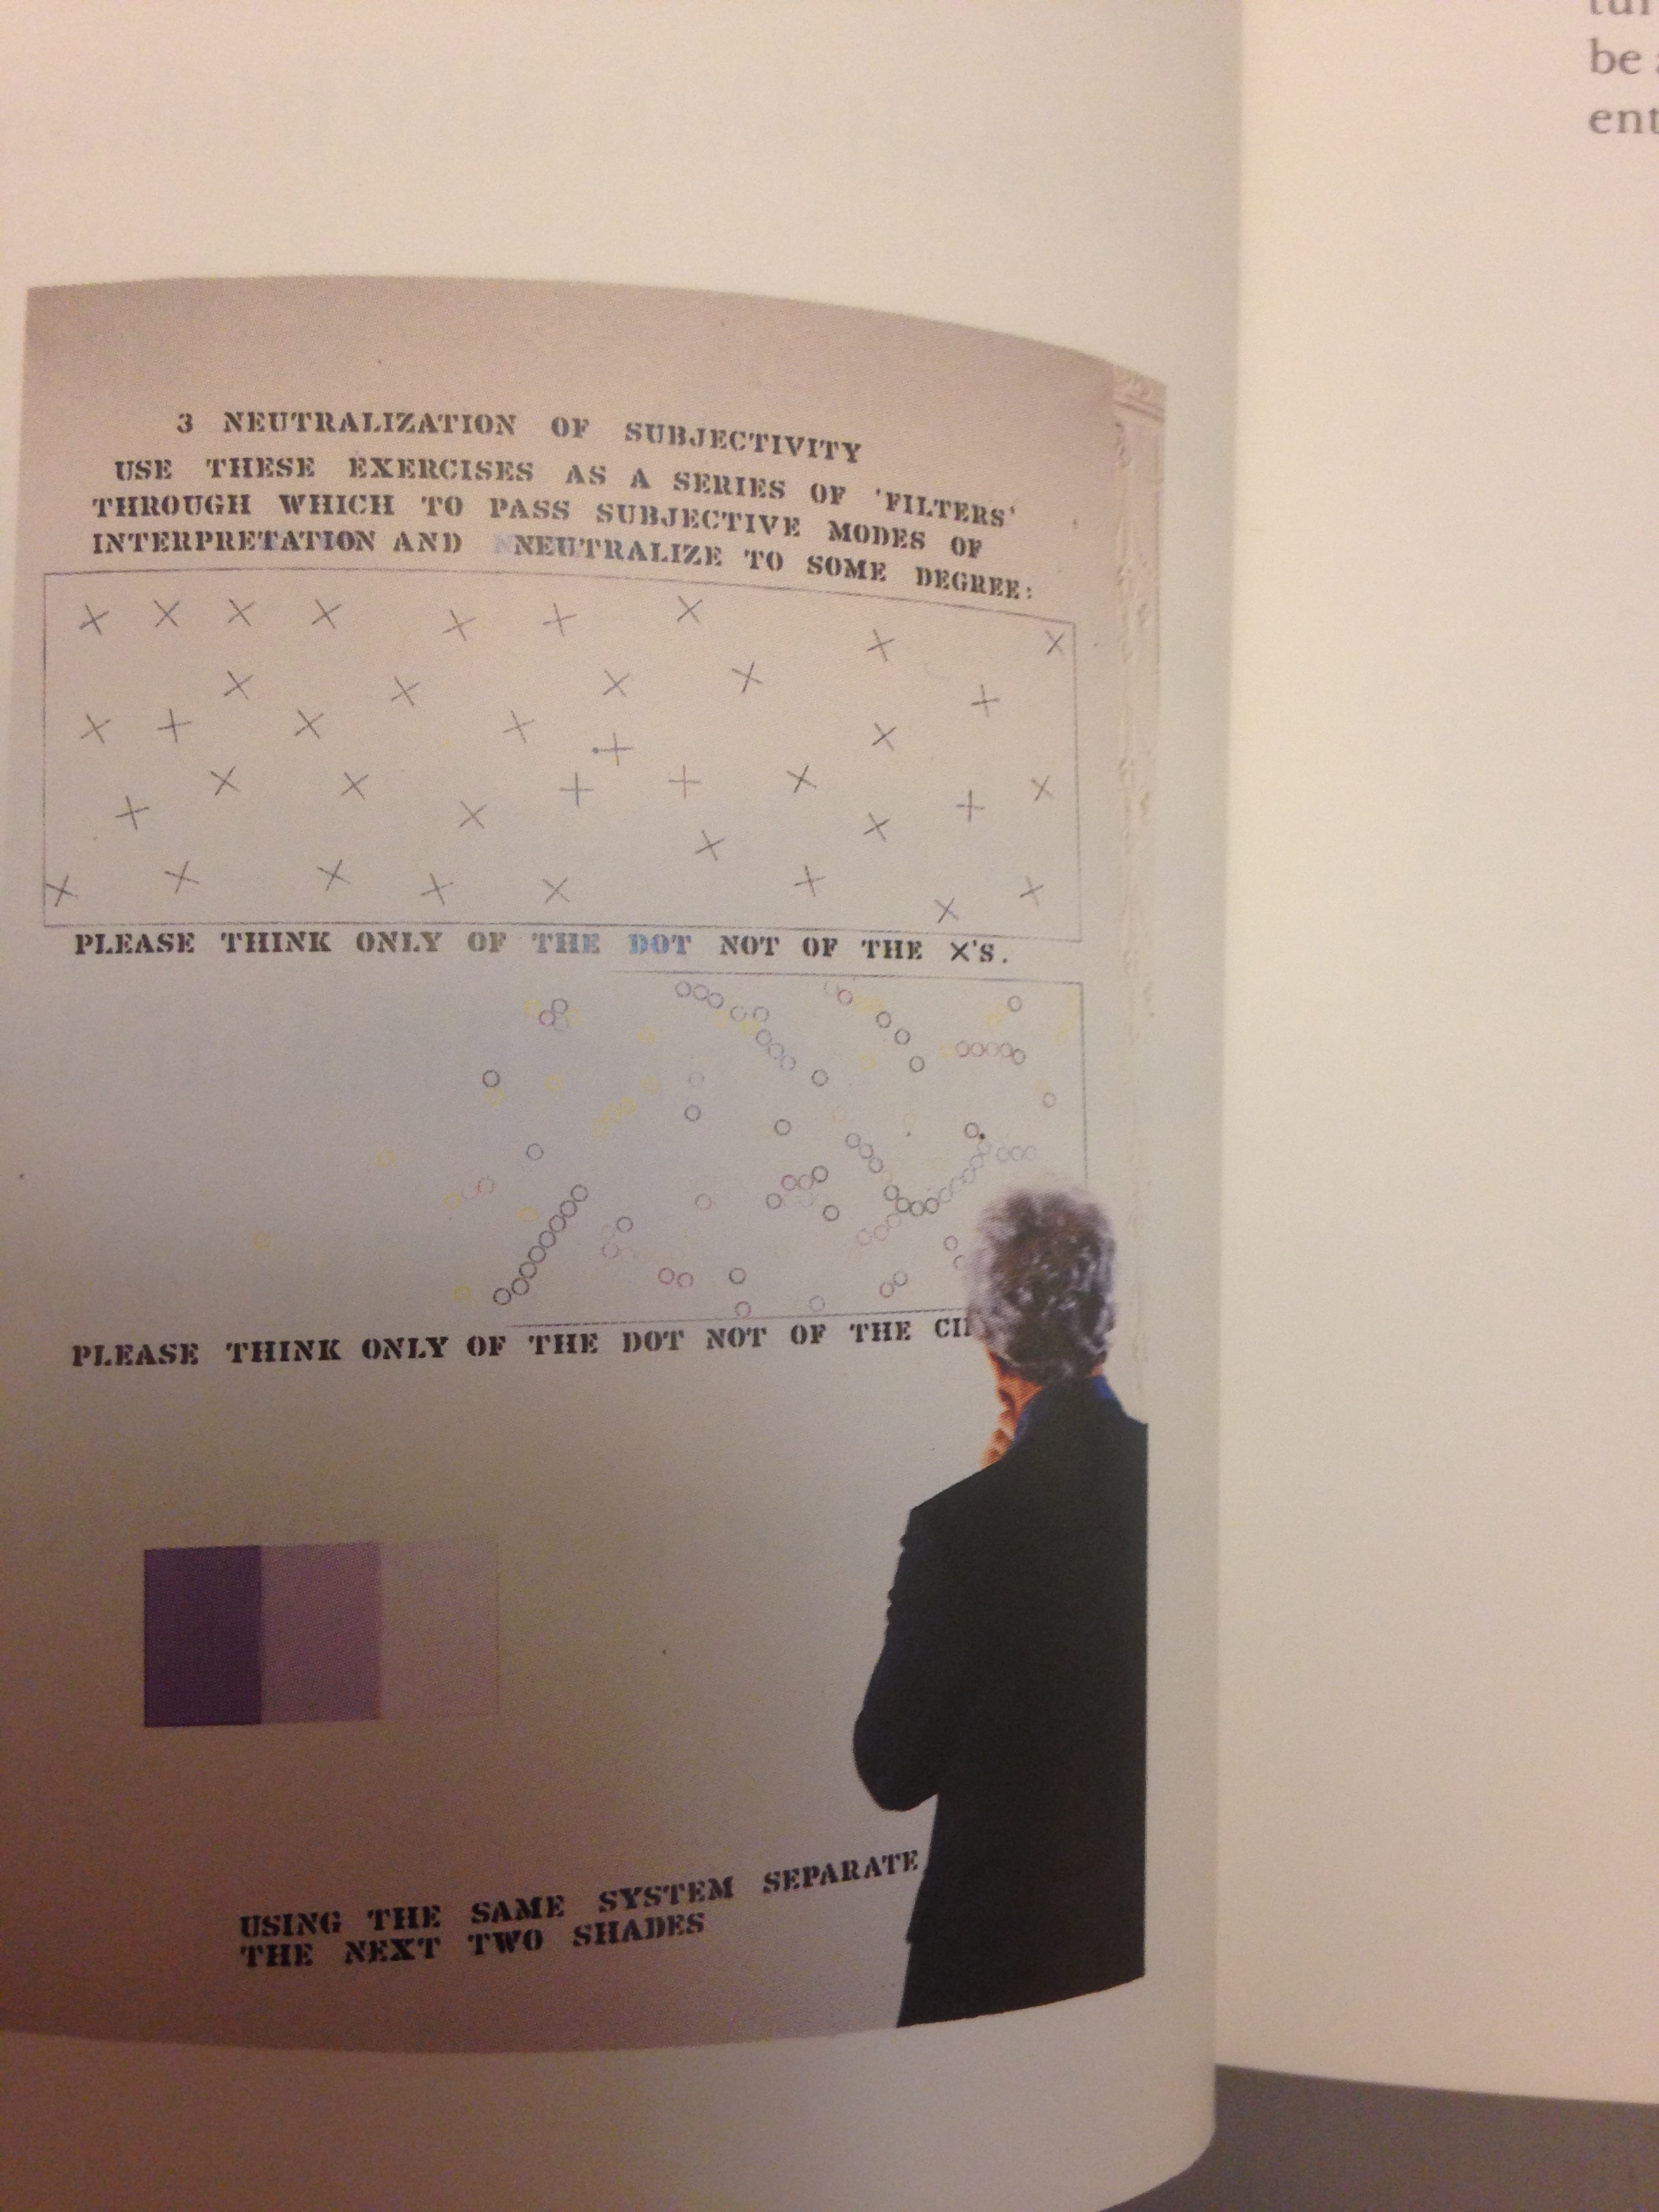 Edition 2 [Detail installation documentation]